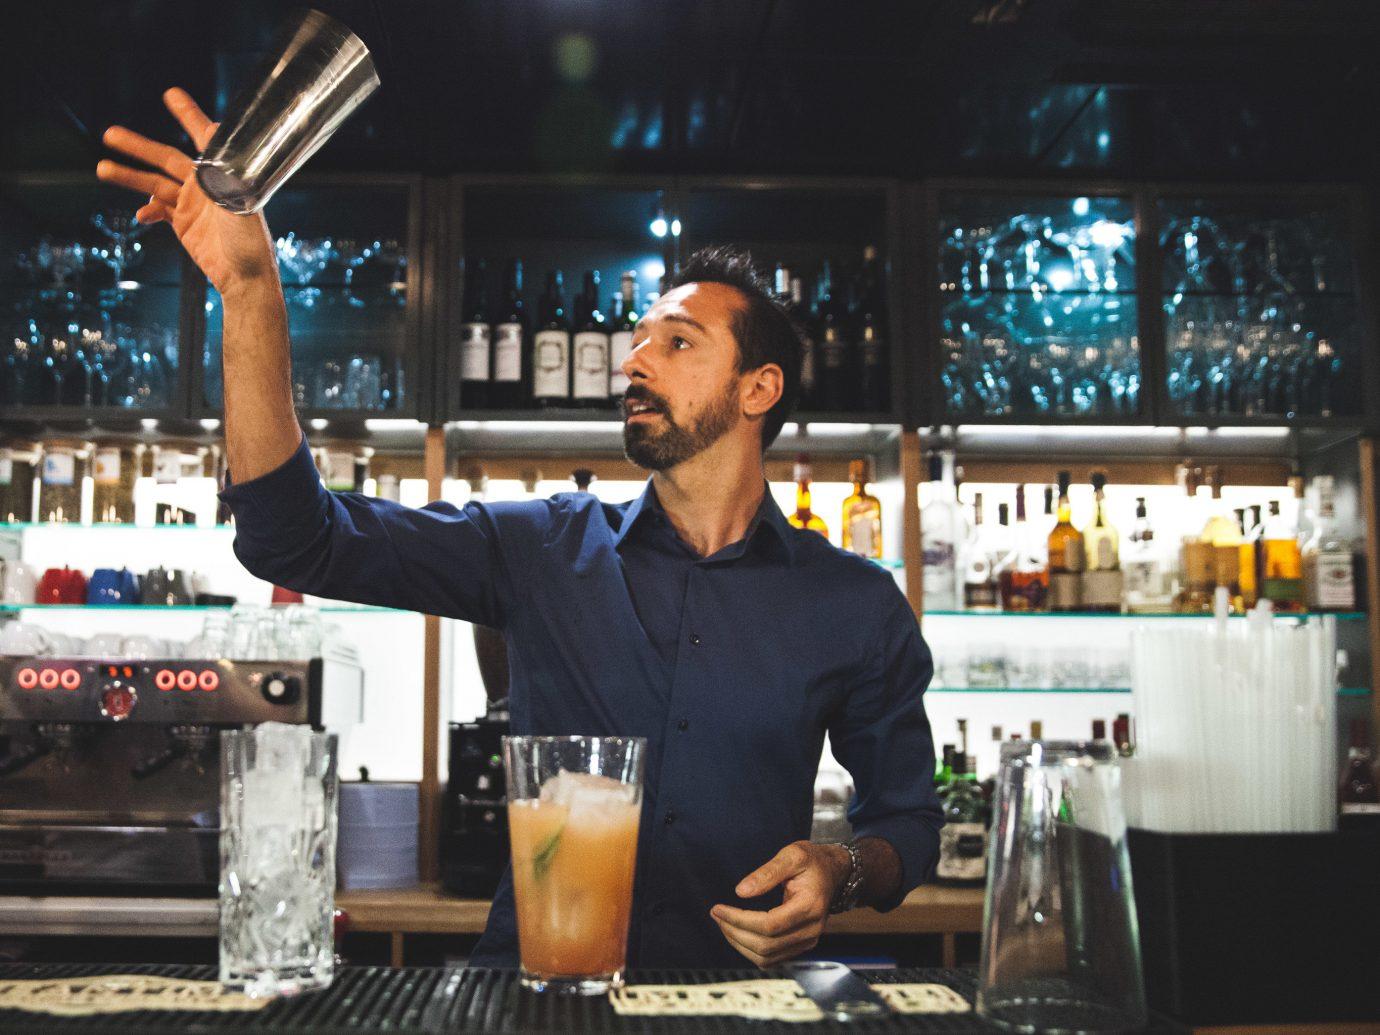 Budget Hotels London person indoor man appliance bartender sense Bar Drink drinking